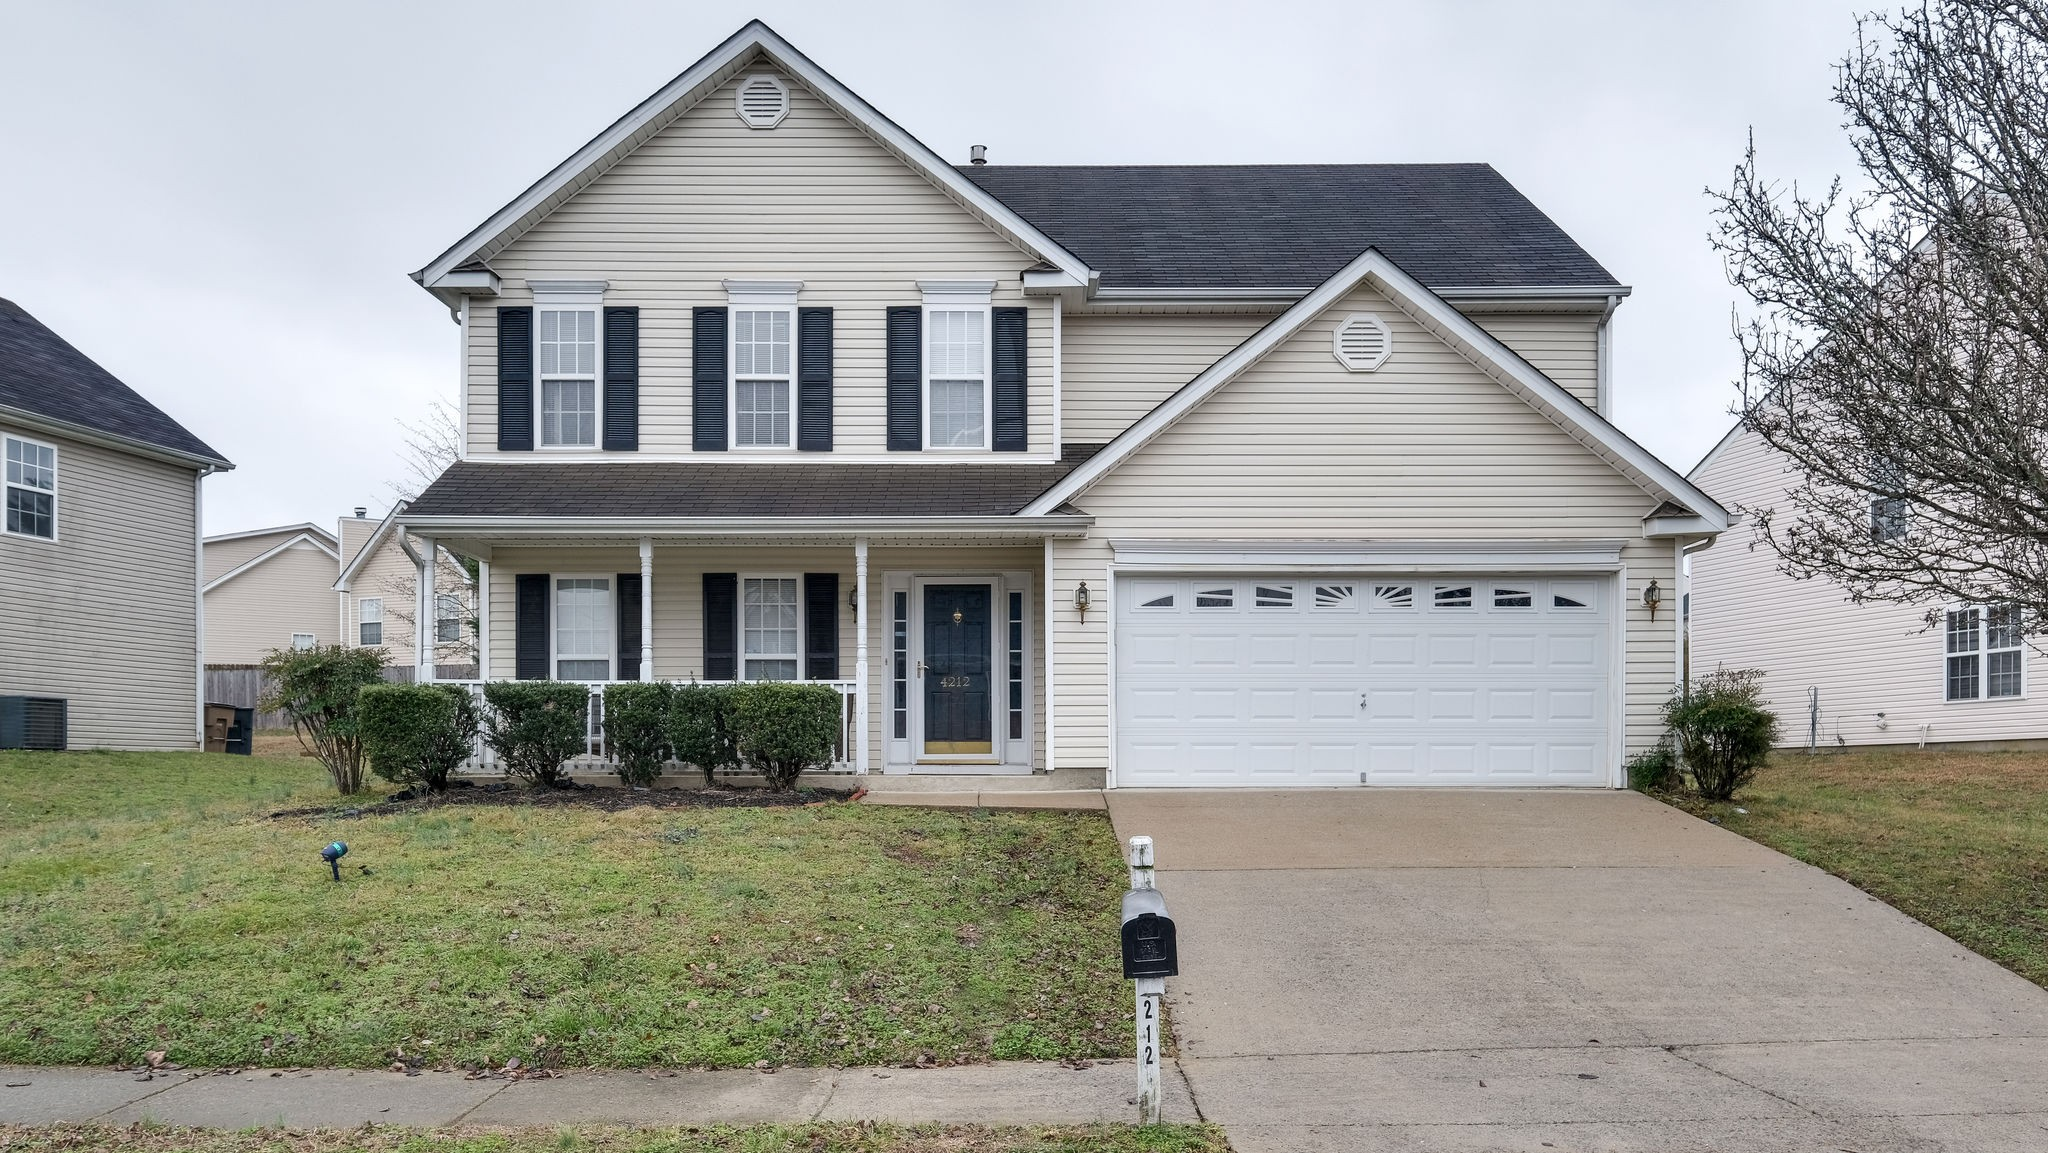 4212 Sandstone Dr, Antioch, TN 37013 - Antioch, TN real estate listing